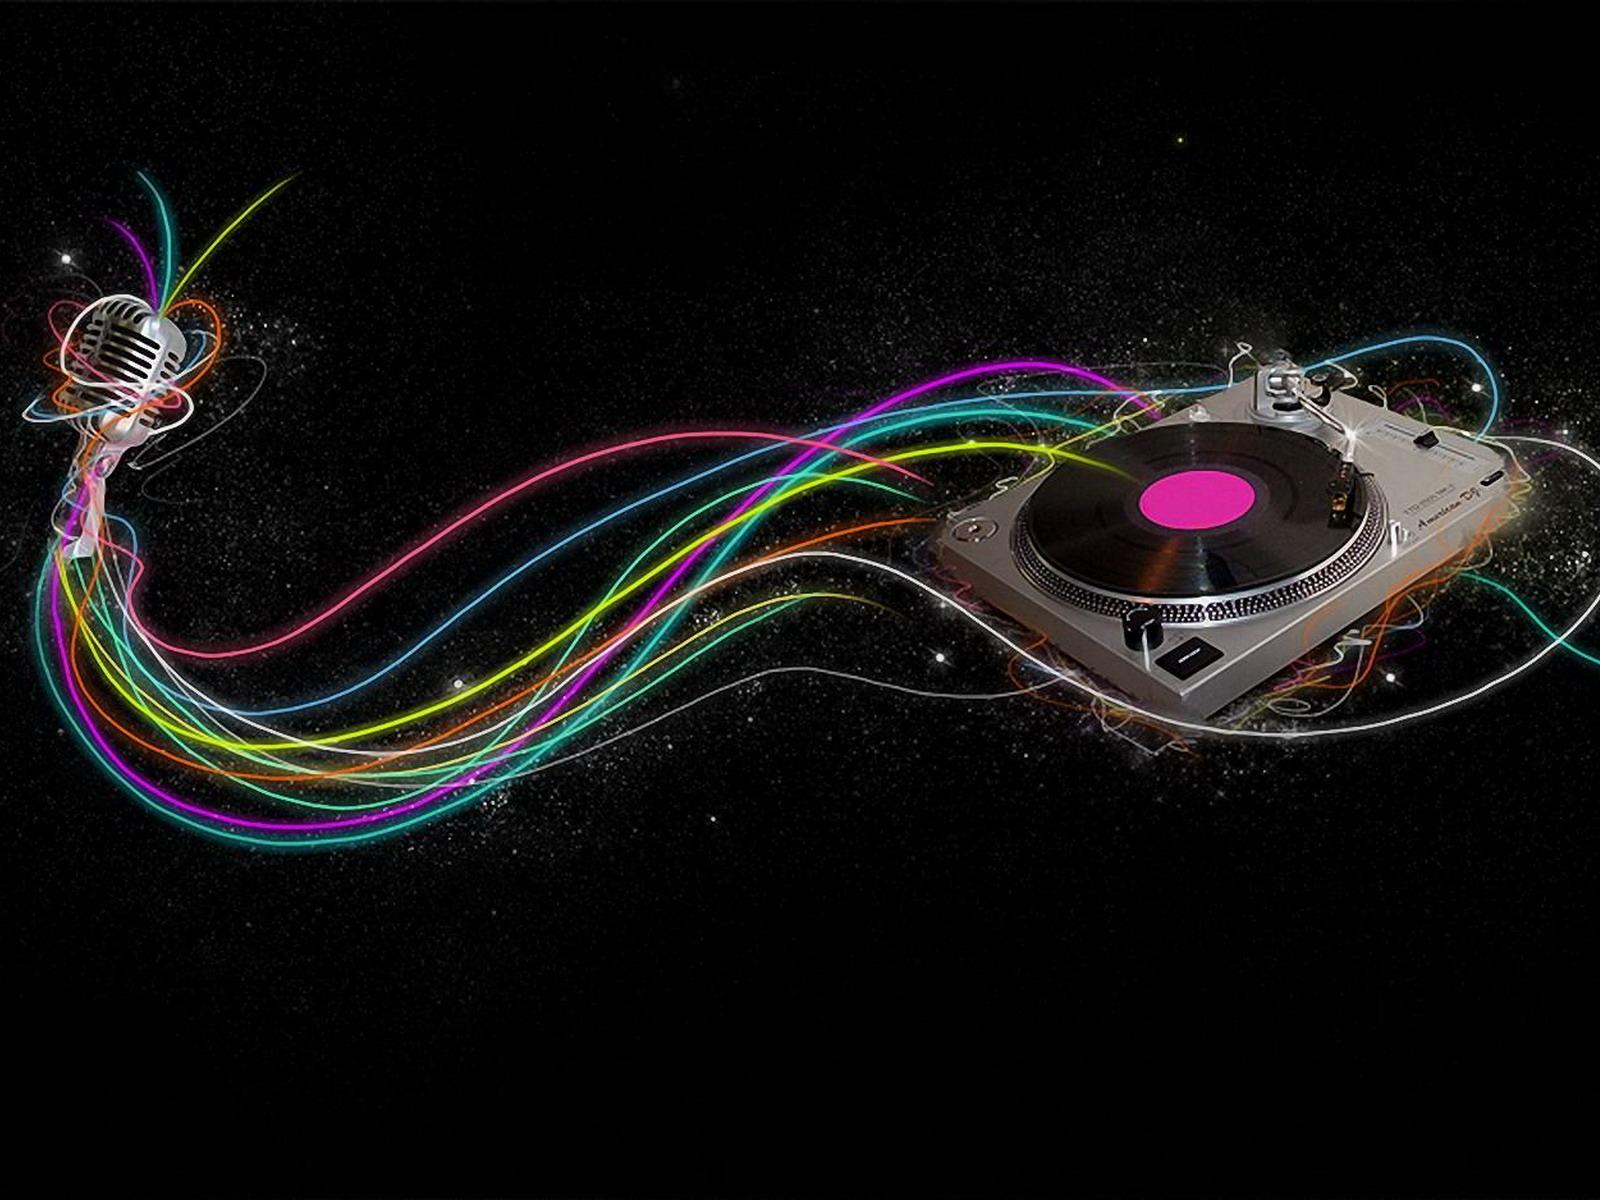 http://2.bp.blogspot.com/-bkLuOeHF2u4/T99rMD2XtQI/AAAAAAAAAls/Fk4QGUUDpzk/s1600/mic-and-dj-gear-wallpaper.jpg